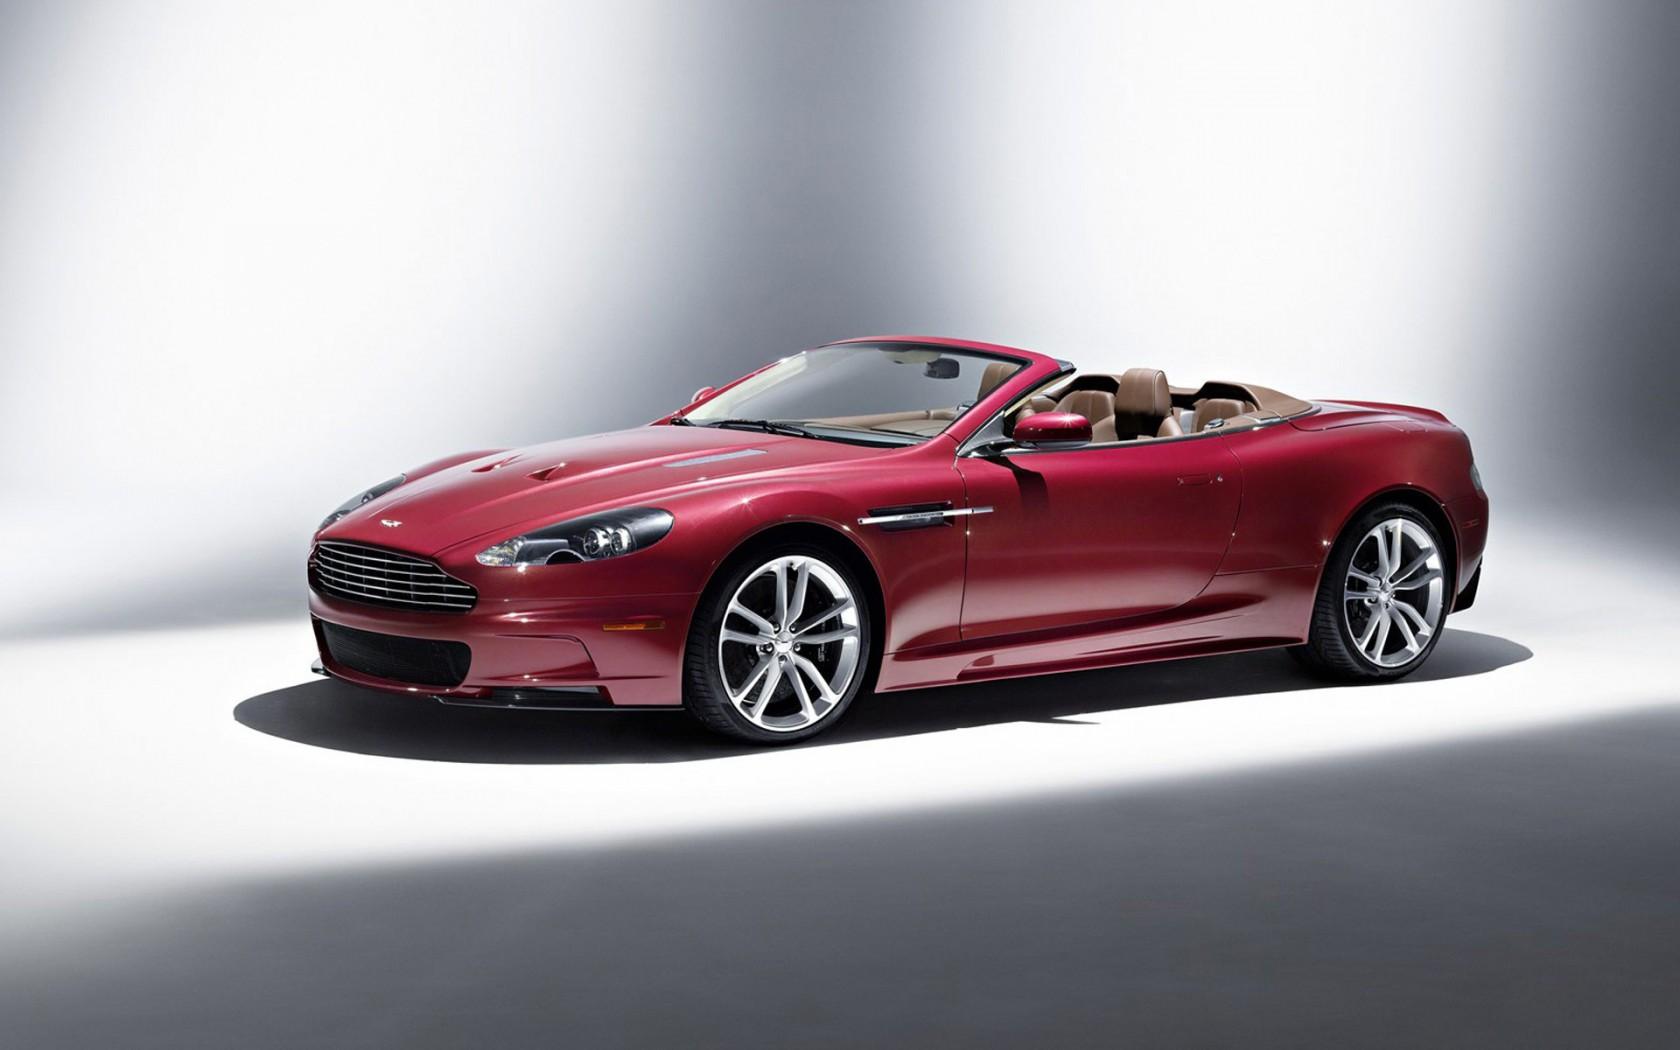 Aston-Martin-DBS-Volante